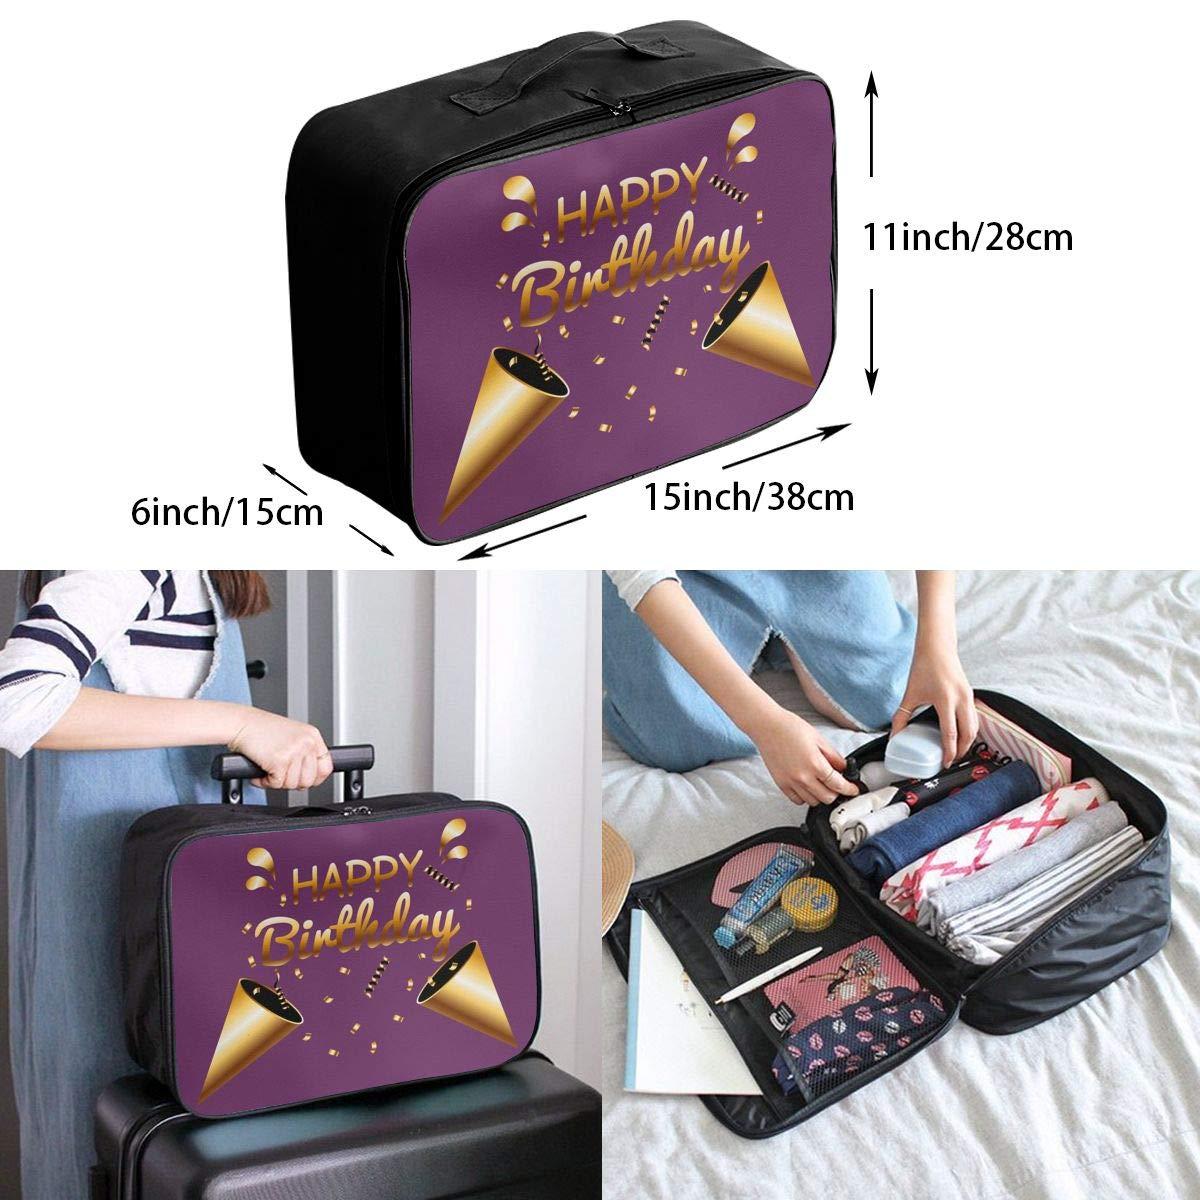 Travel Luggage Duffle Bag Lightweight Portable Handbag Happy Birthday Large Capacity Waterproof Foldable Storage Tote